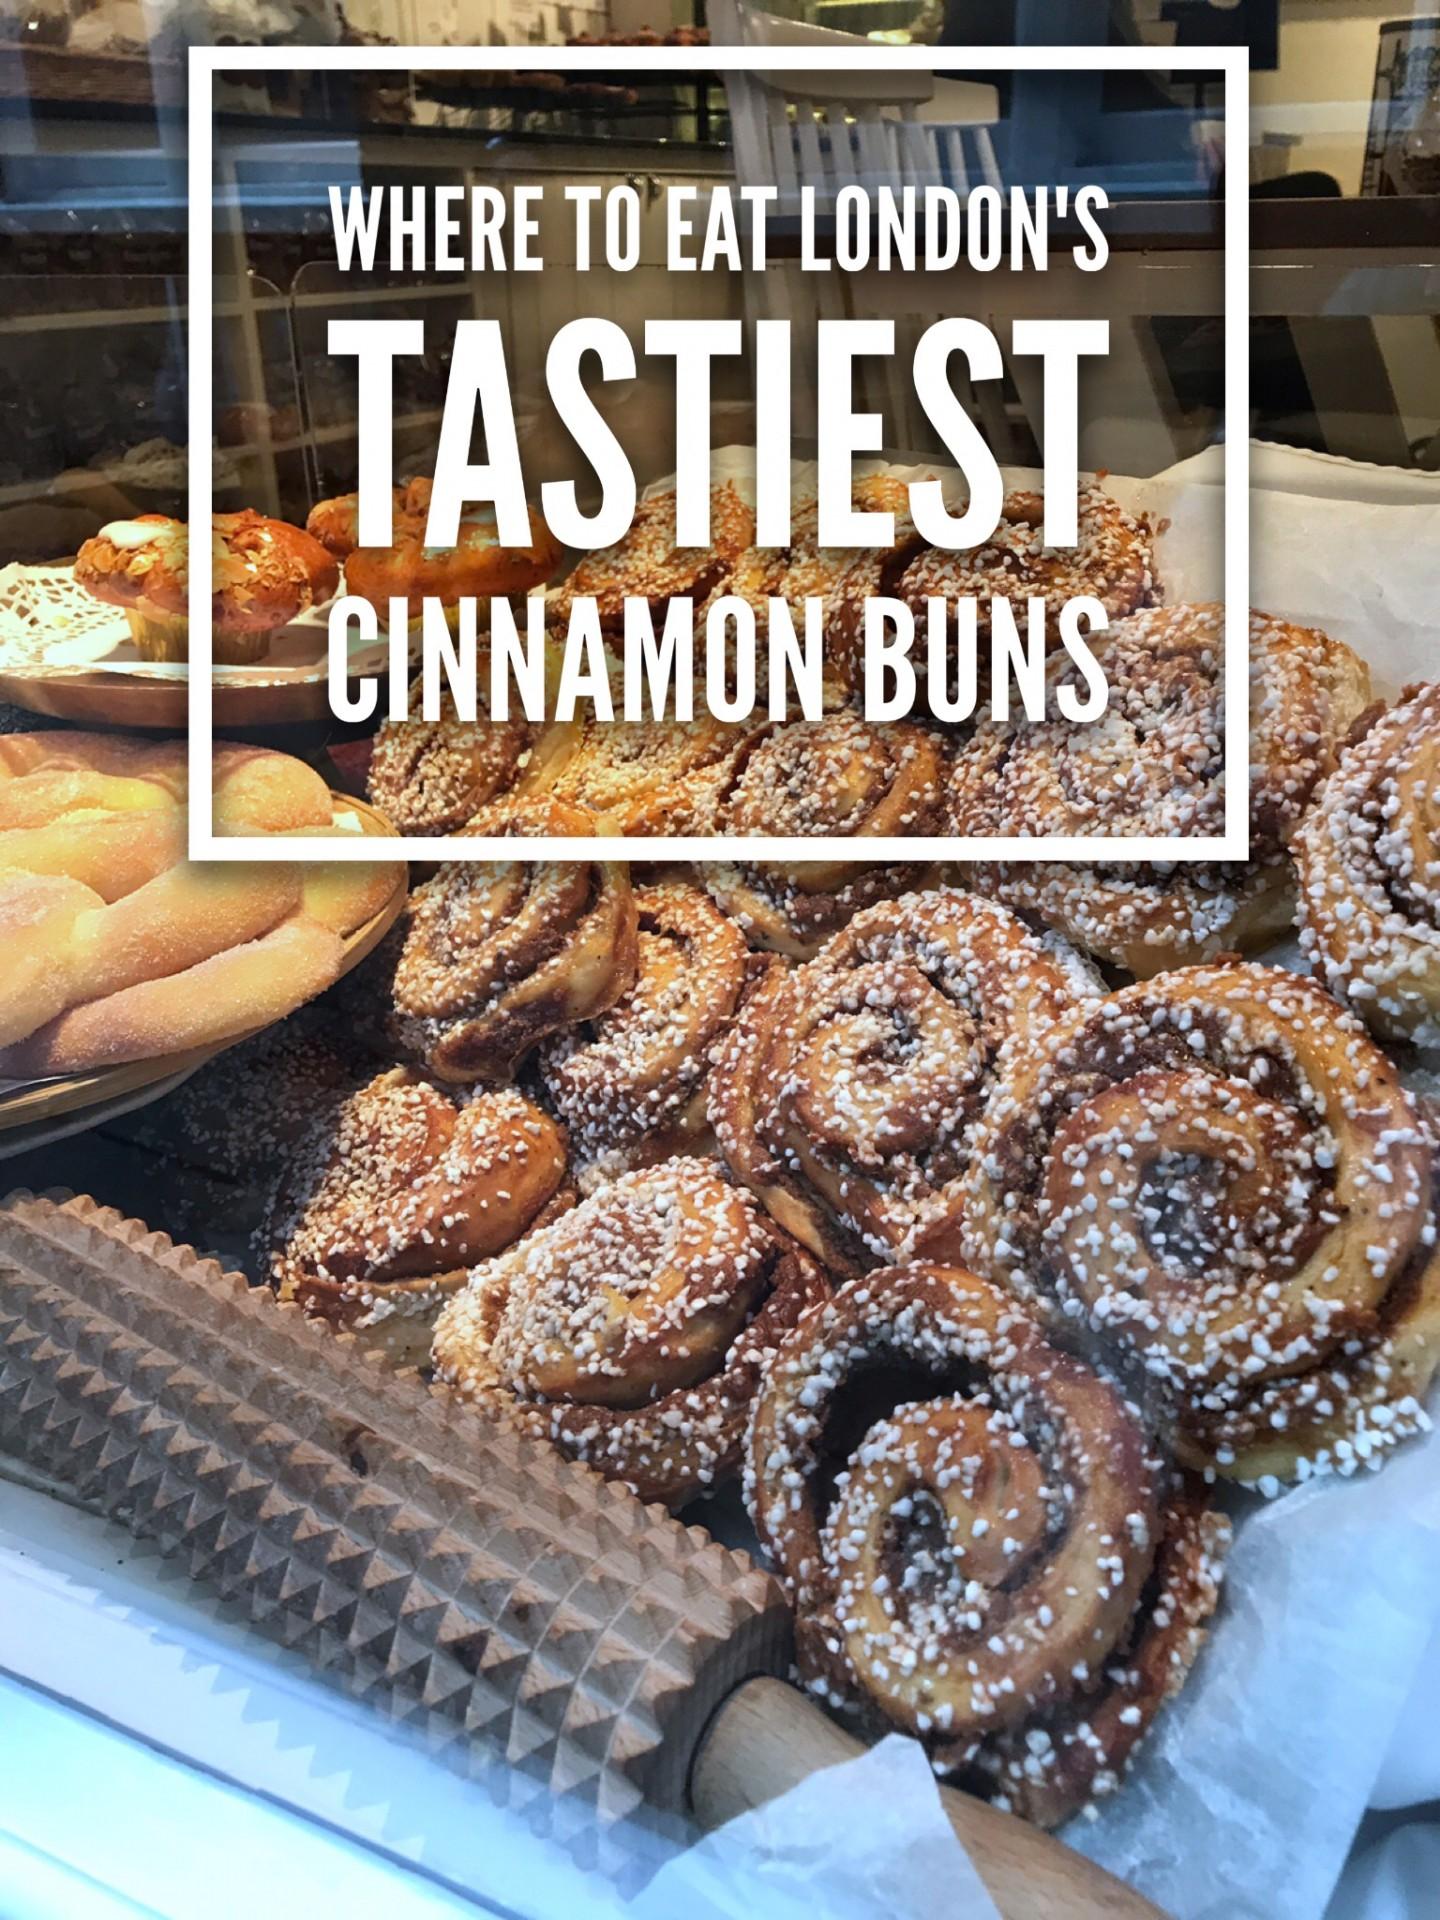 Where to Eat London's Tastiest Cinnamon Buns